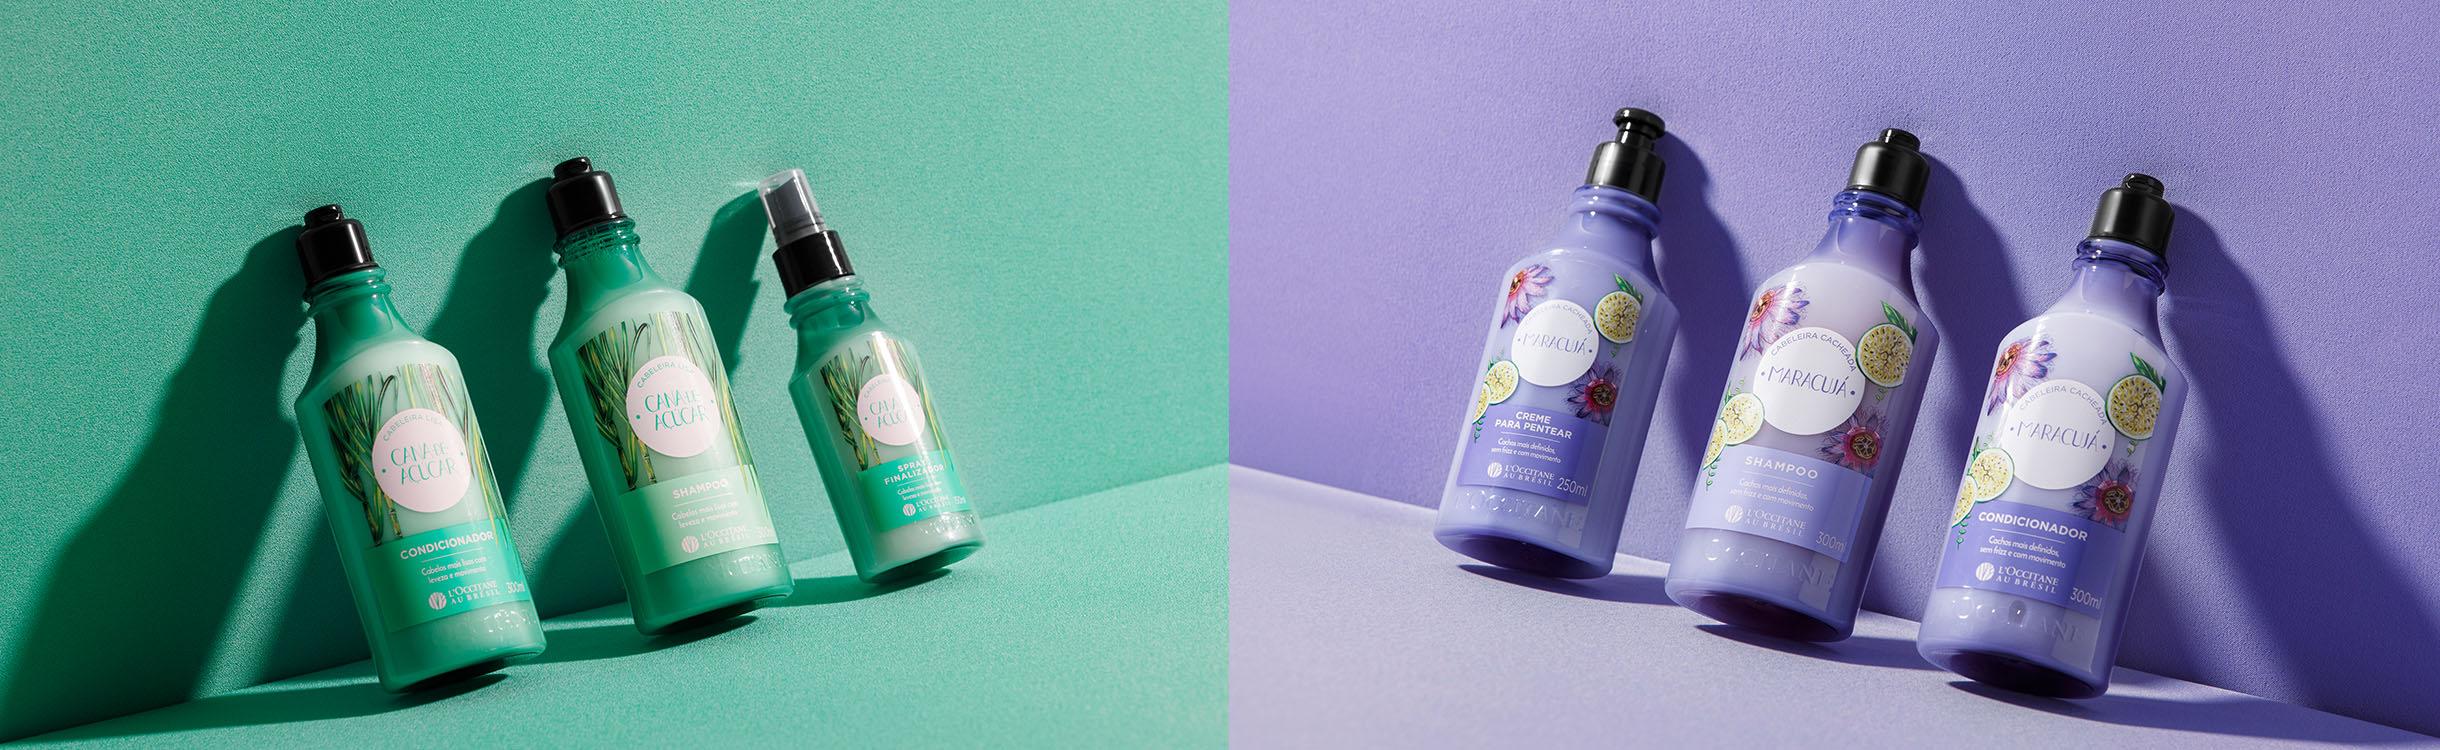 Shampoo L'Occitane au Brésil